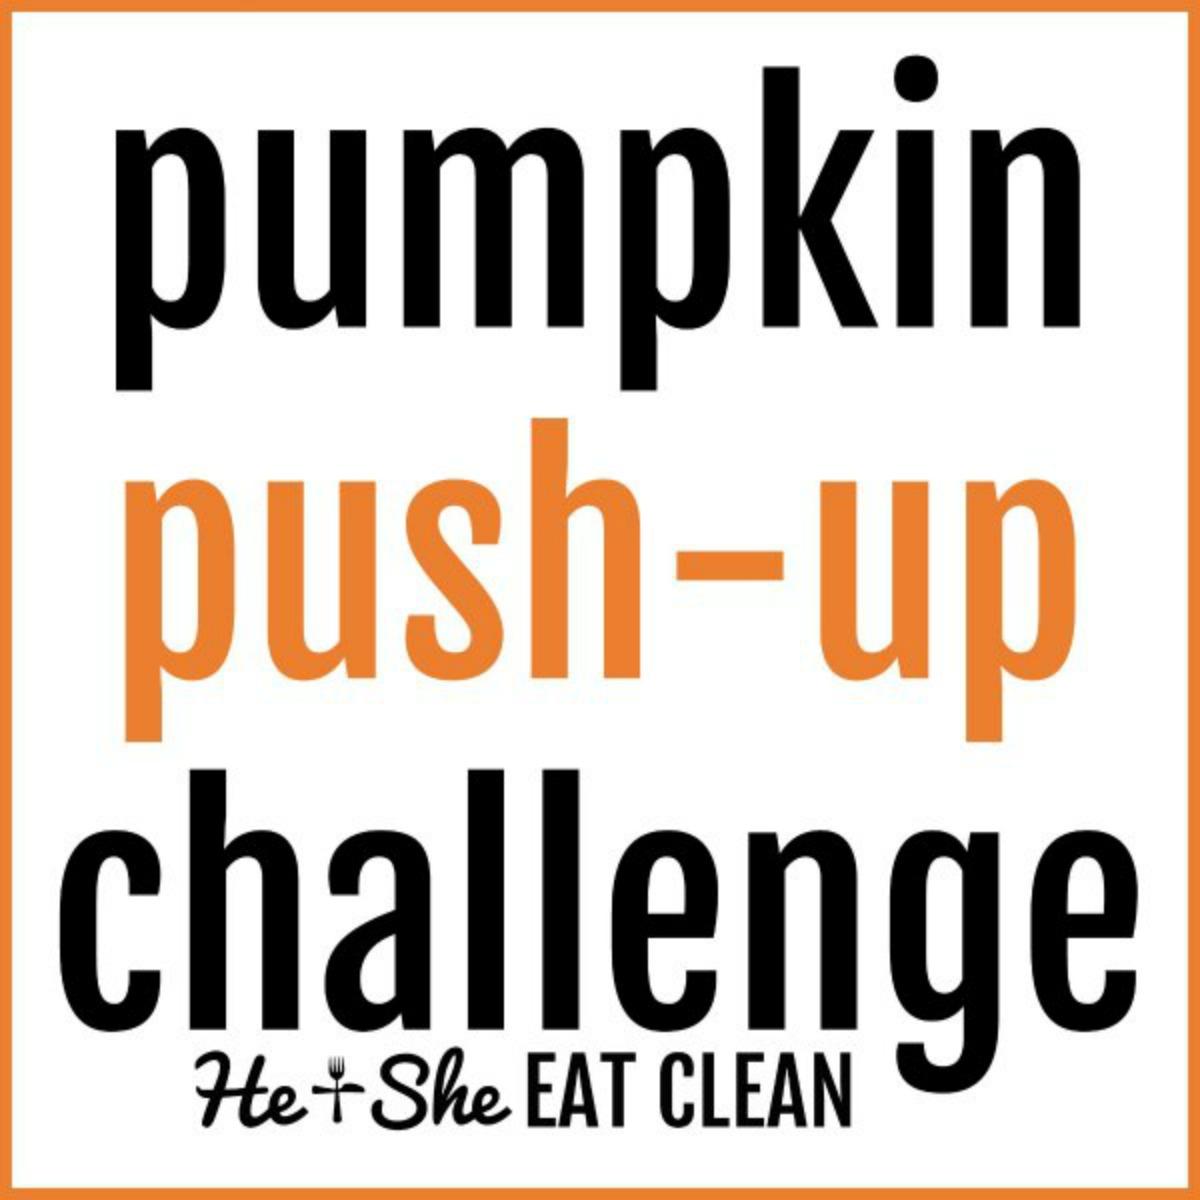 text reads pumpkin push-up challenge